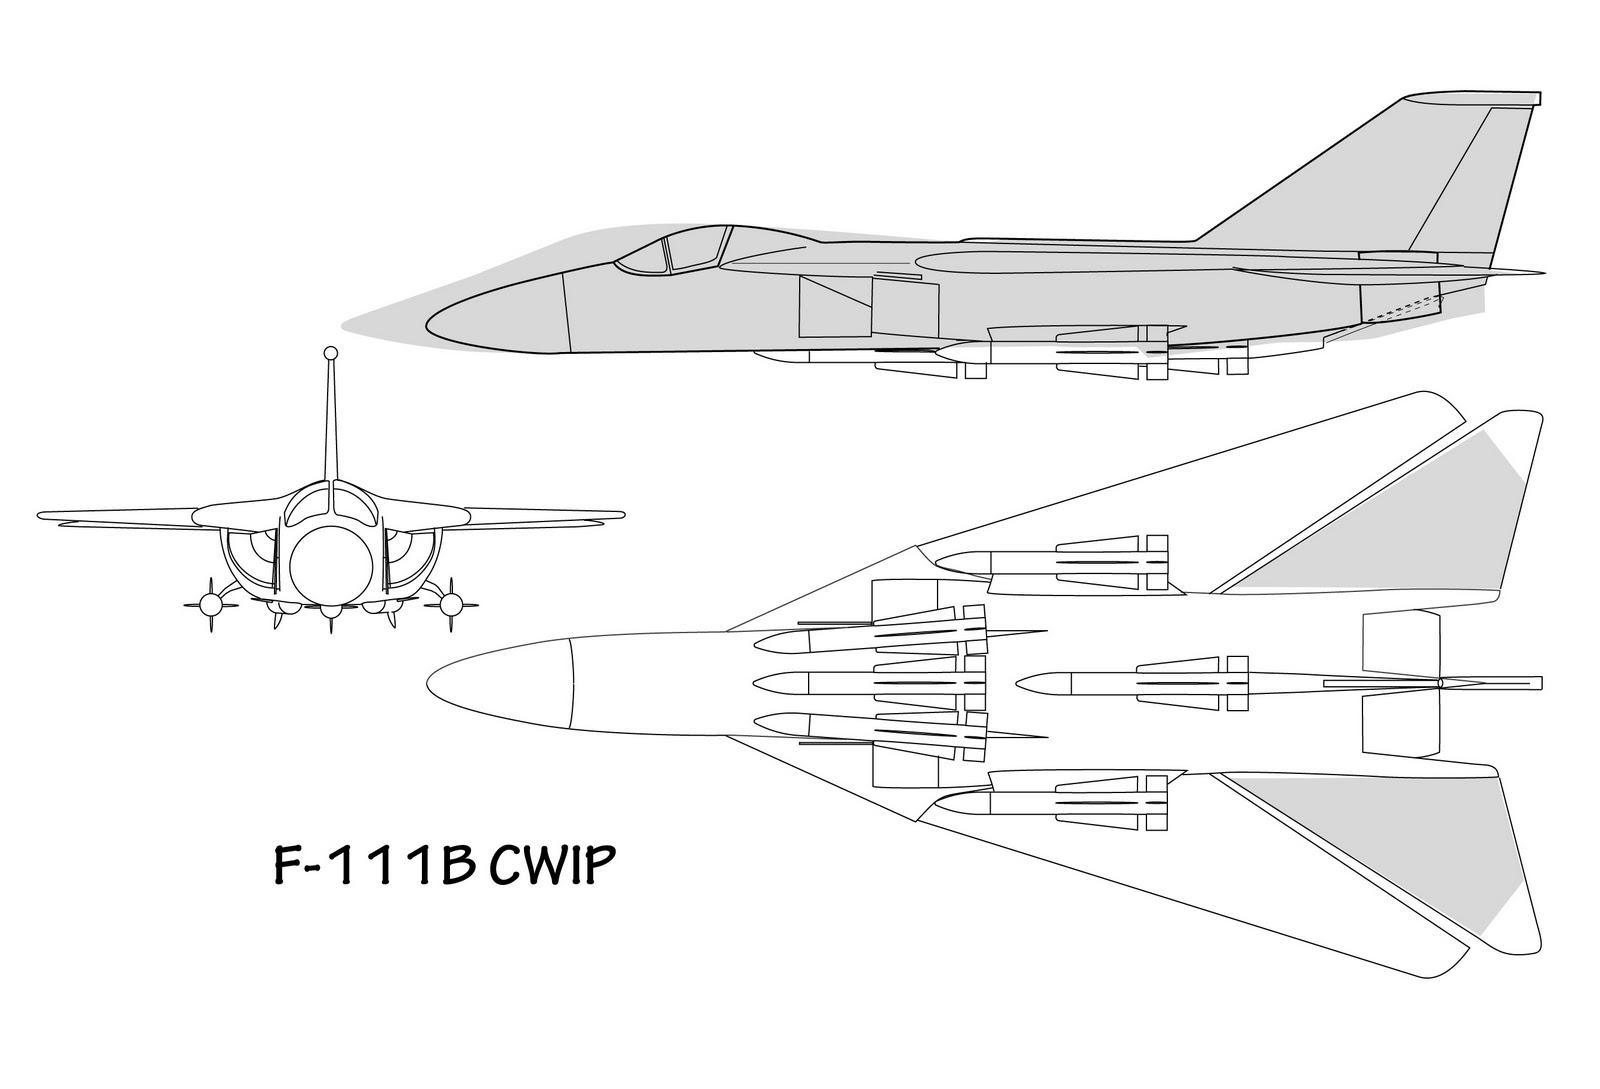 f-111b_cwip_3_view.jpg